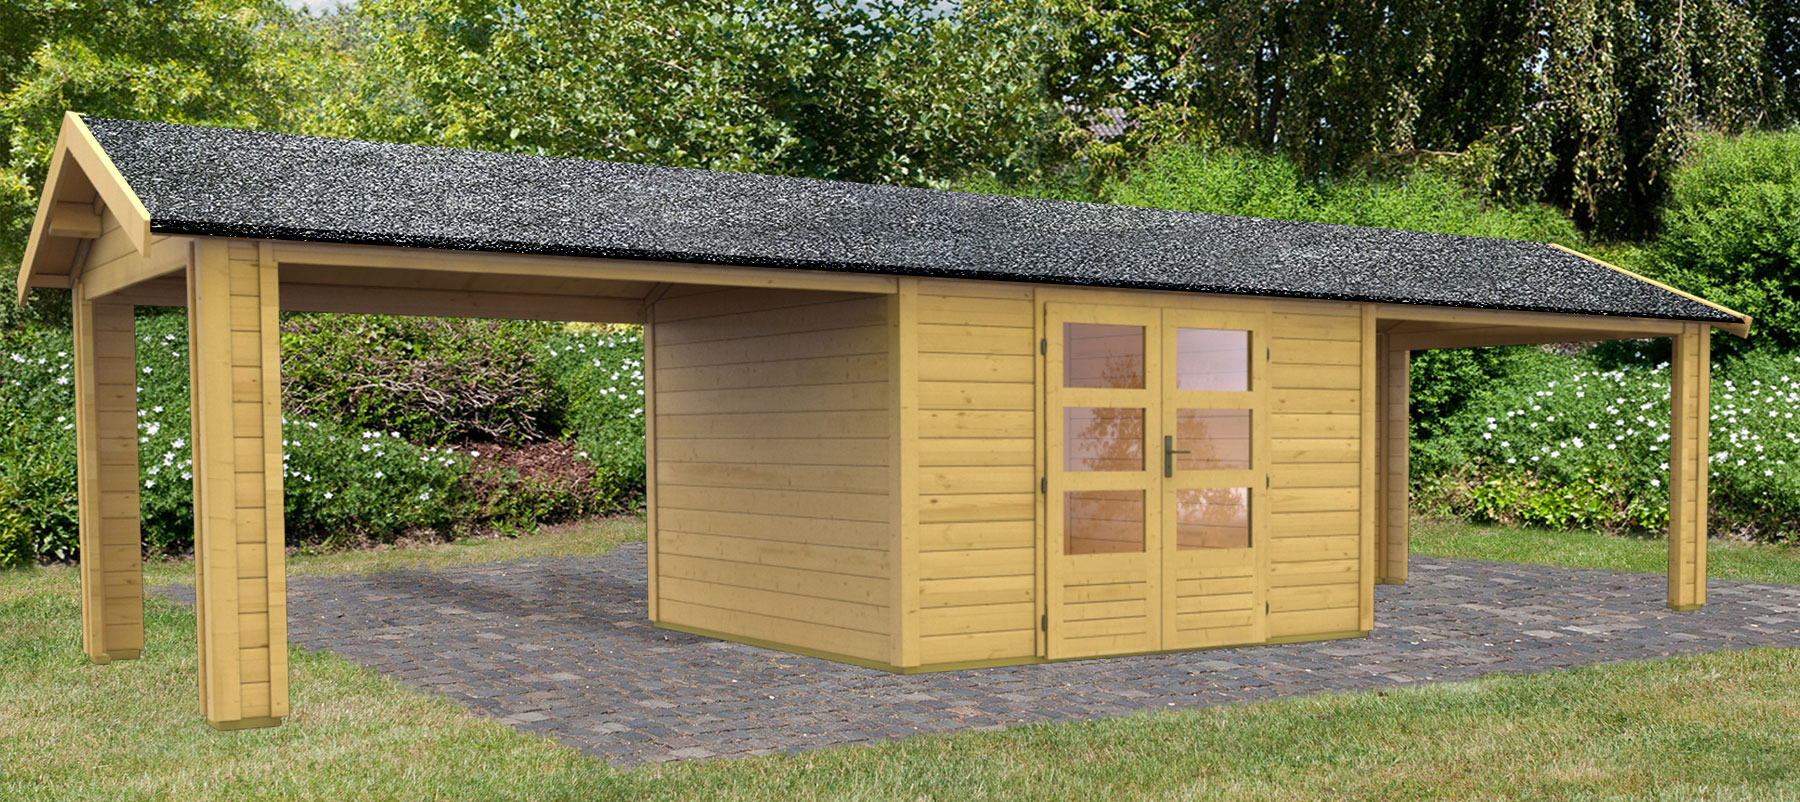 woodfeeling gartenhaus 28 mm thor 7 natur 328x348cm set 2 bei. Black Bedroom Furniture Sets. Home Design Ideas